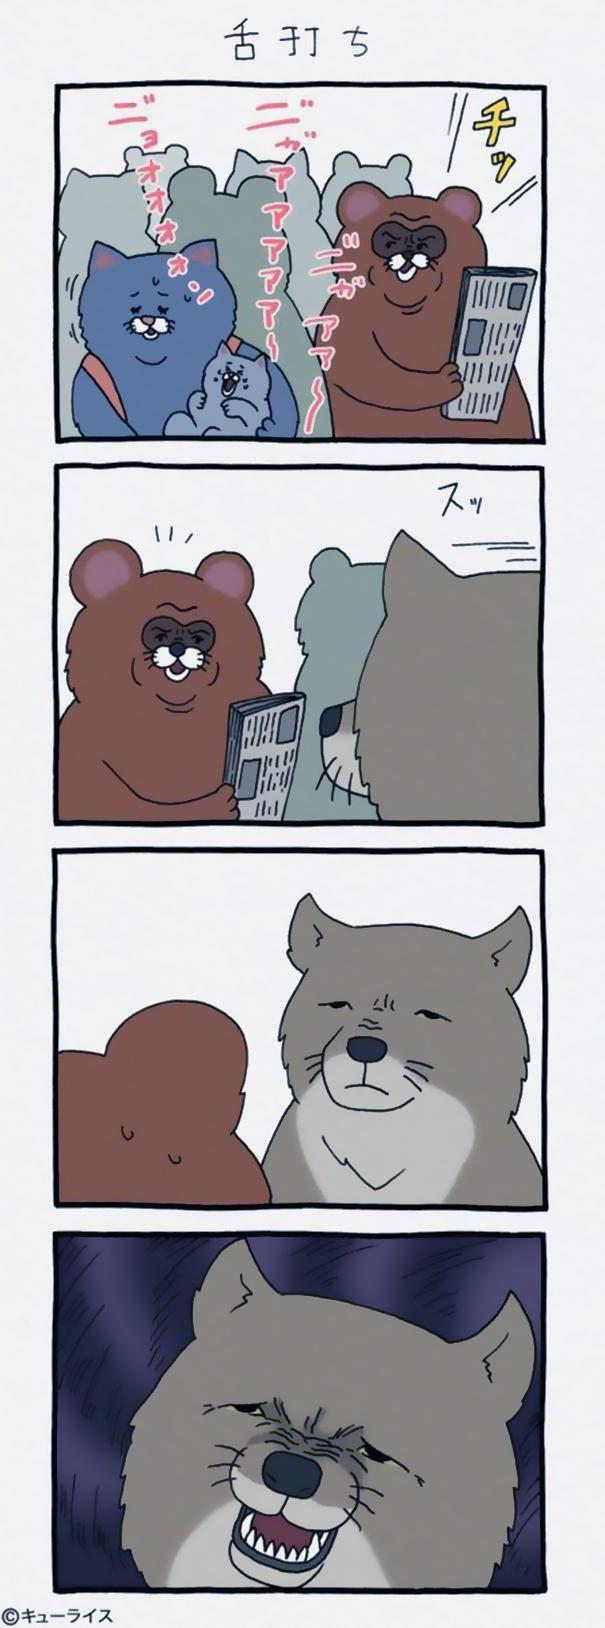 dog cartoon comics qrais japan 9 59895b392d9e9  605 - 우울한 당신을 웃게 해줄 '착한 티벳 여우' 4컷 만화